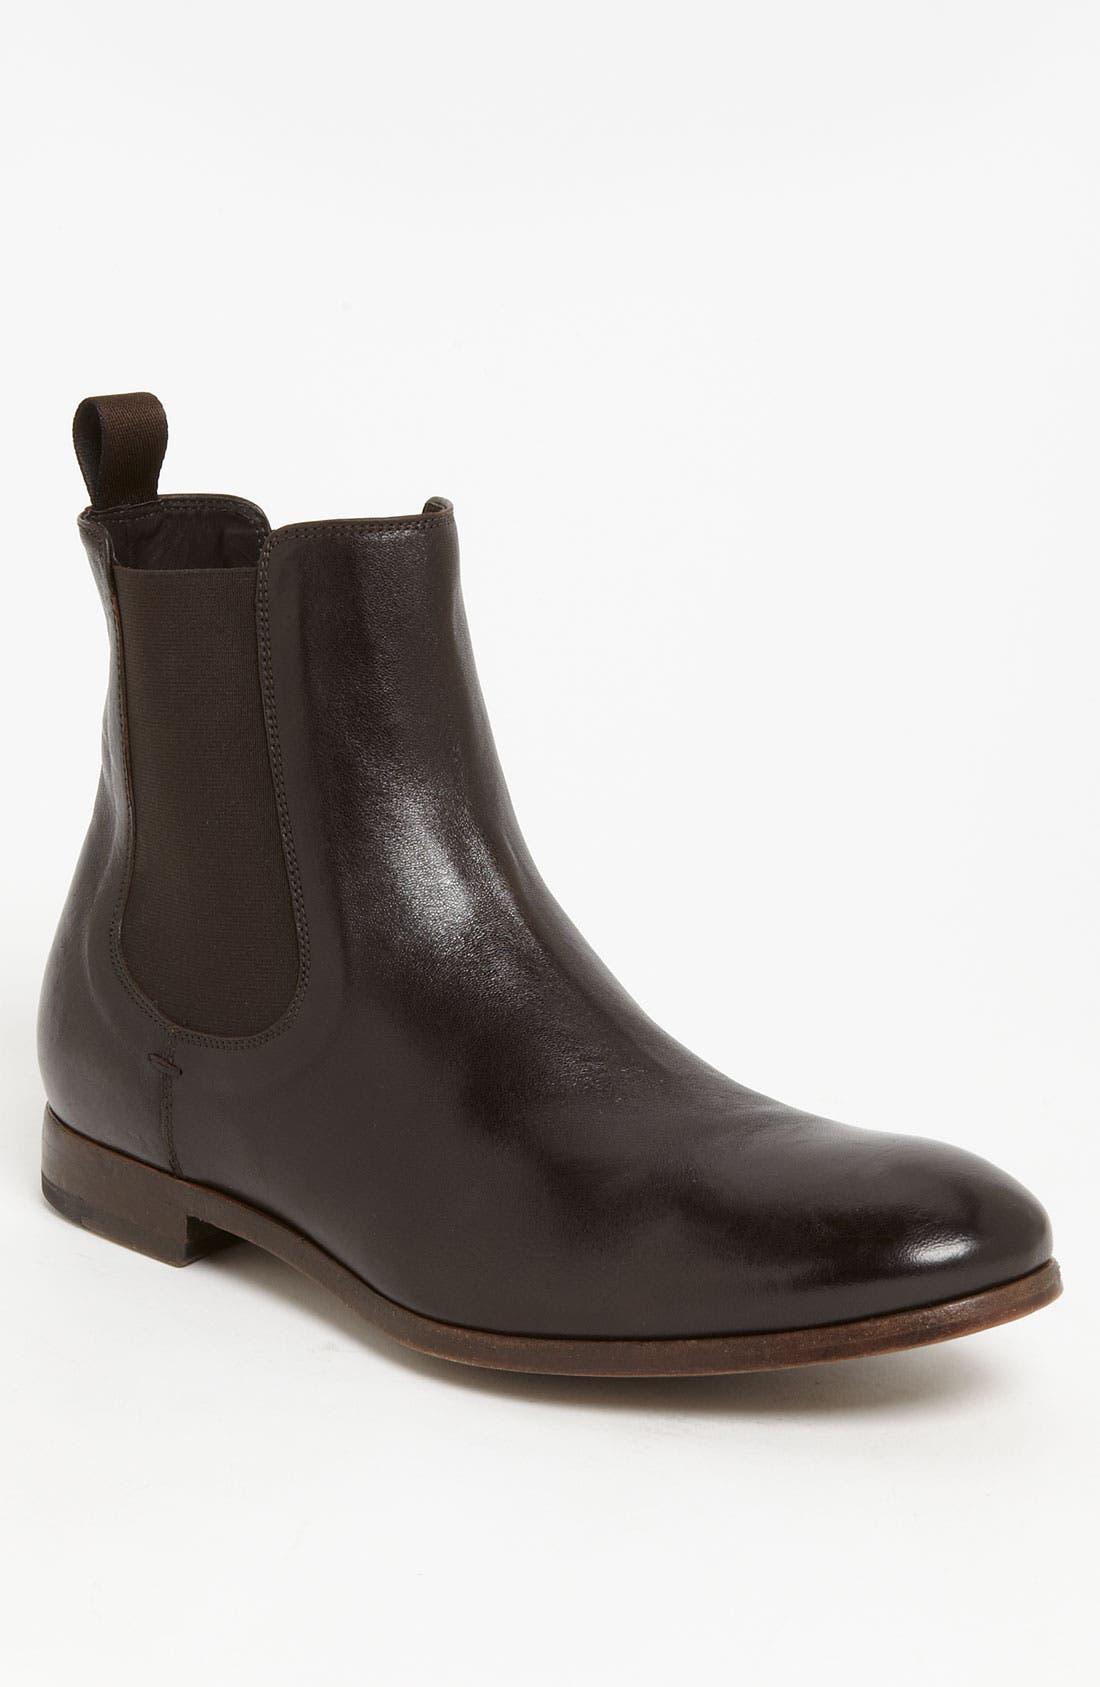 Alternate Image 1 Selected - Paul Smith 'Otter' Chelsea Boot